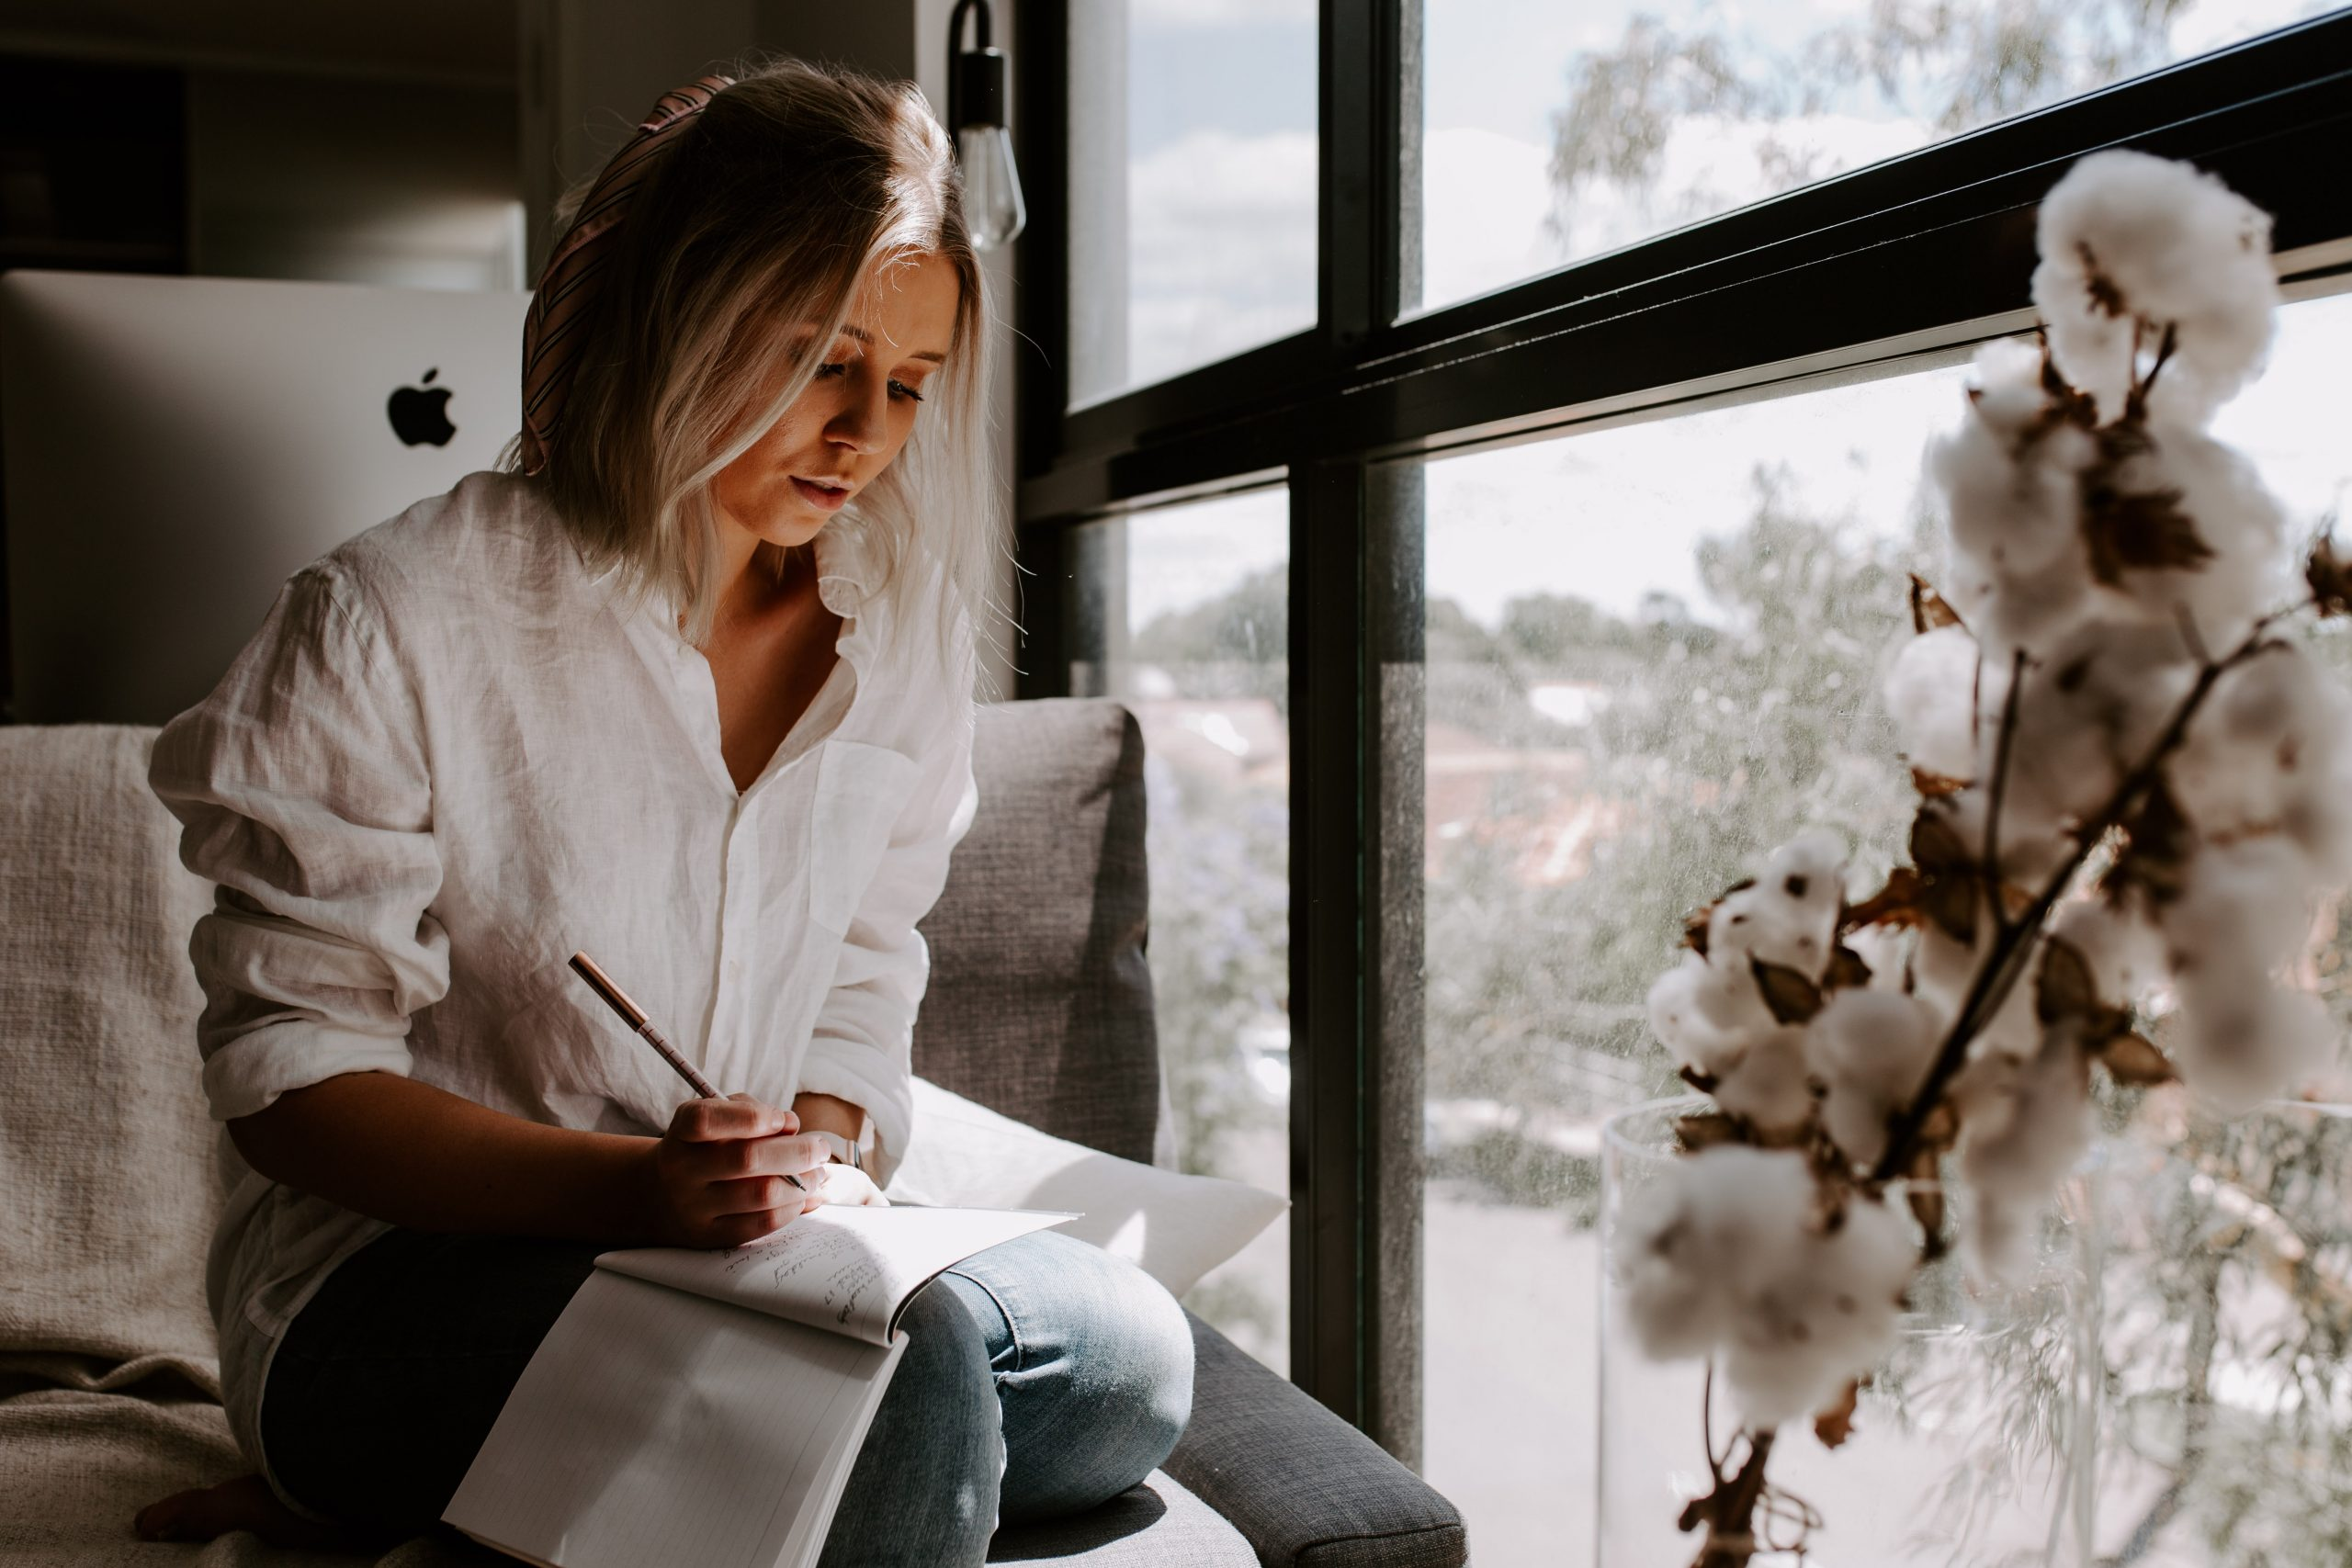 woman writing in a window - Capstone Digital Marketing